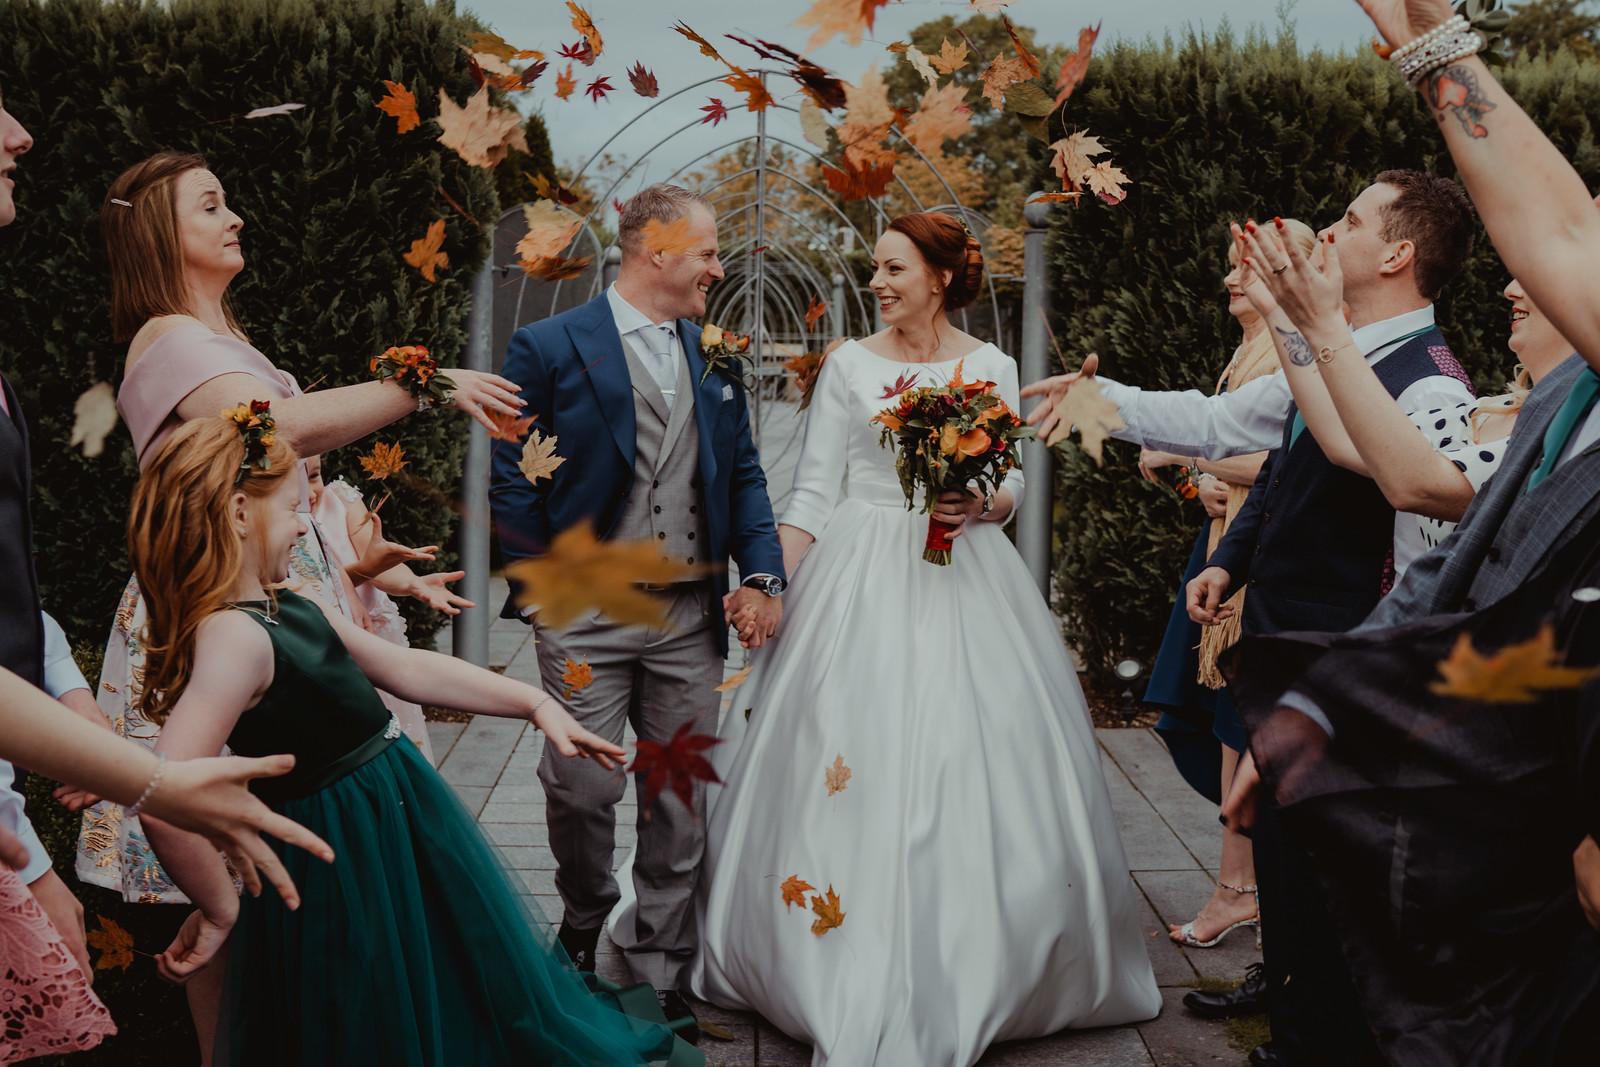 Bride and Groom Confetti Image - Wedding Photographers Essex